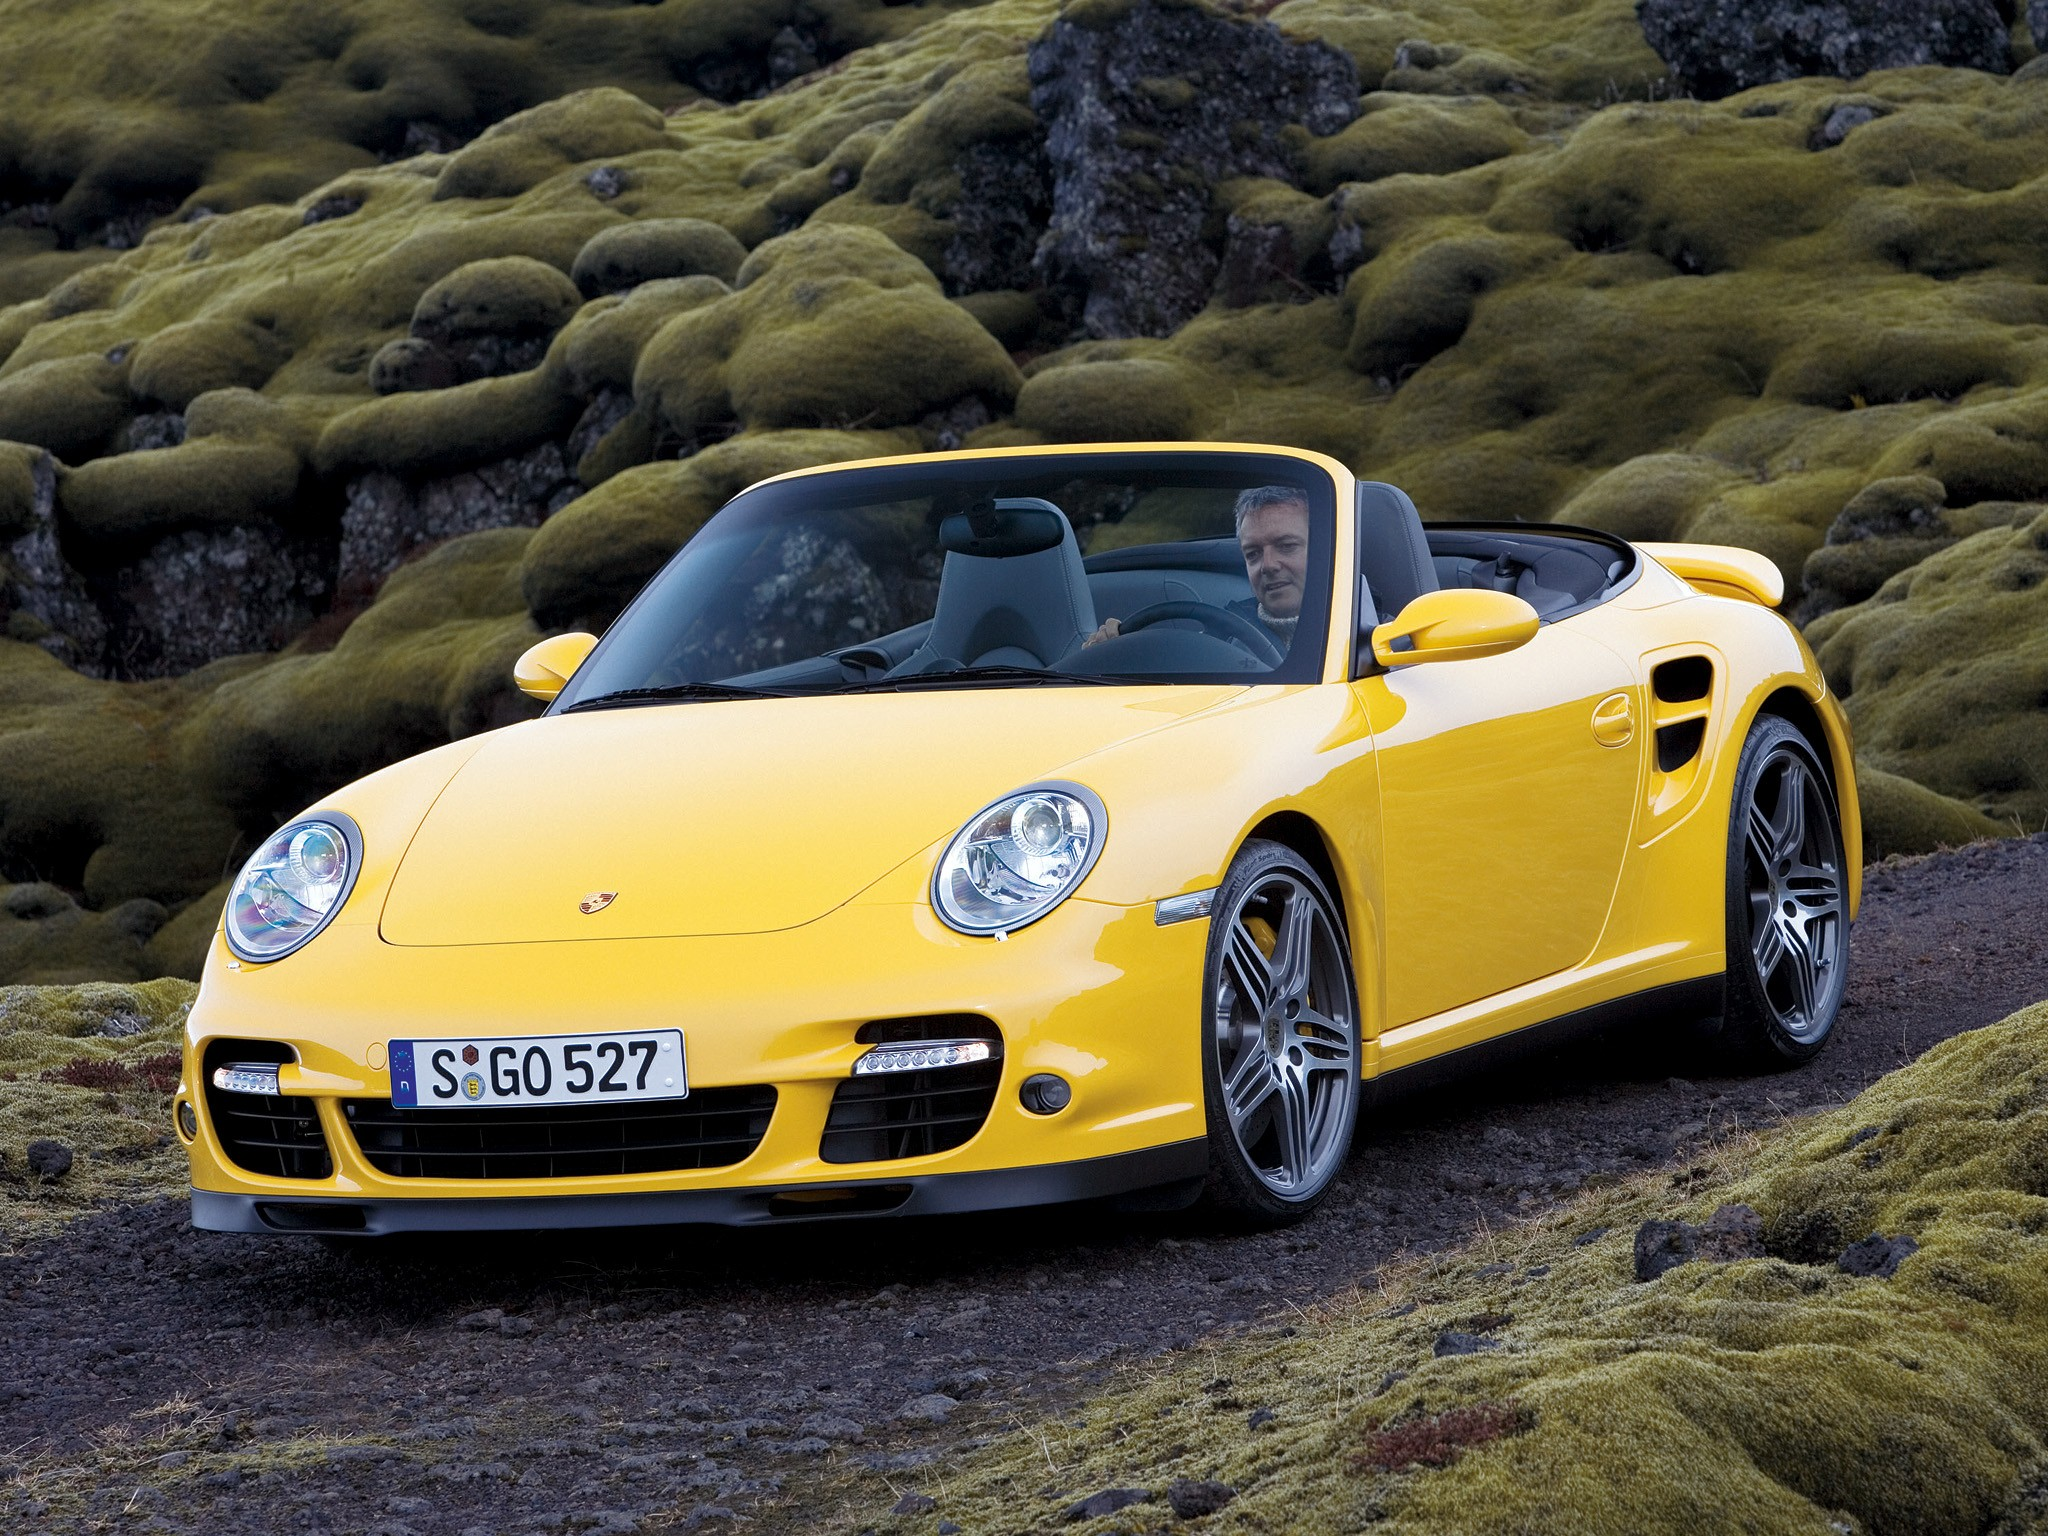 Porsche 911 Turbo S >> PORSCHE 911 Turbo Cabriolet (997) specs & photos - 2007, 2008, 2009 - autoevolution